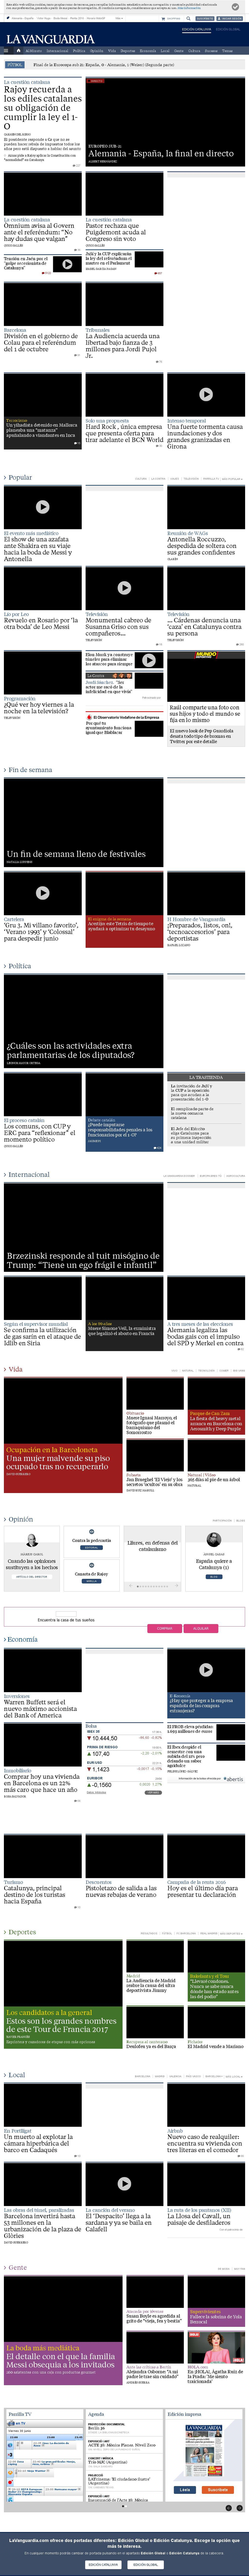 La Vanguardia at Friday June 30, 2017, 8:24 p.m. UTC